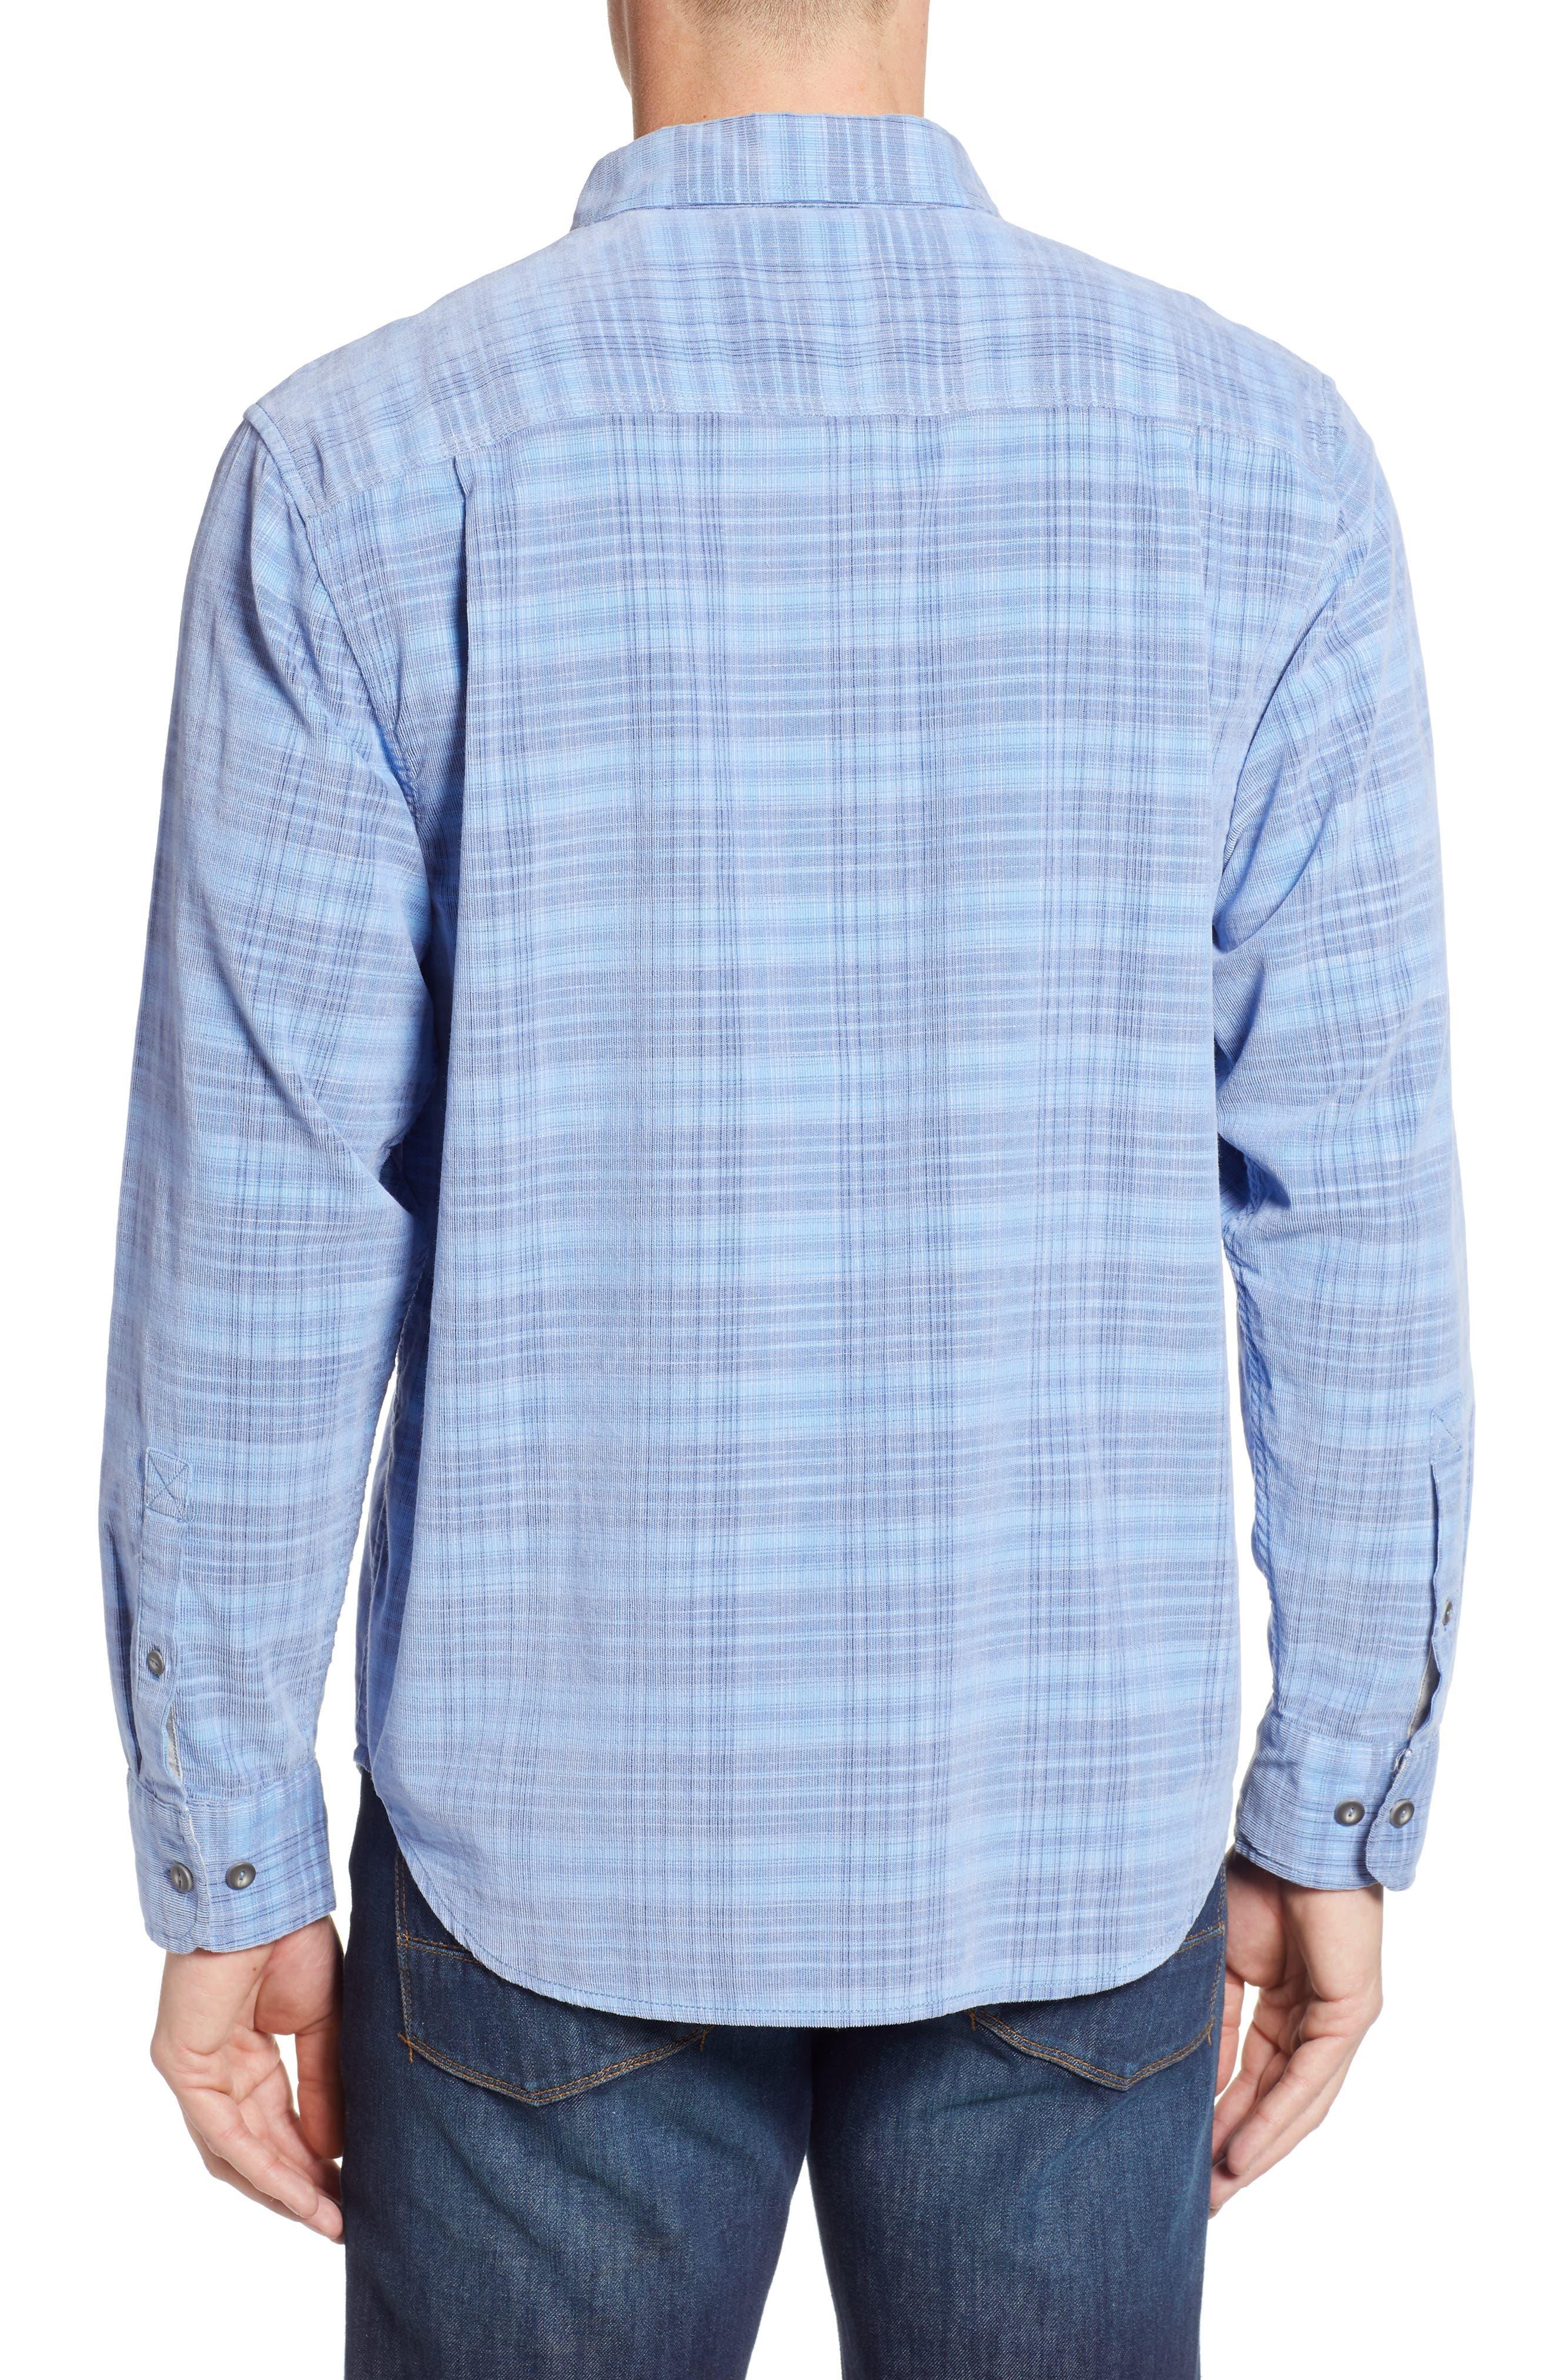 Cruzy Plaid Corduroy Sport Shirt,                             Alternate thumbnail 2, color,                             RIVIERA AZURE